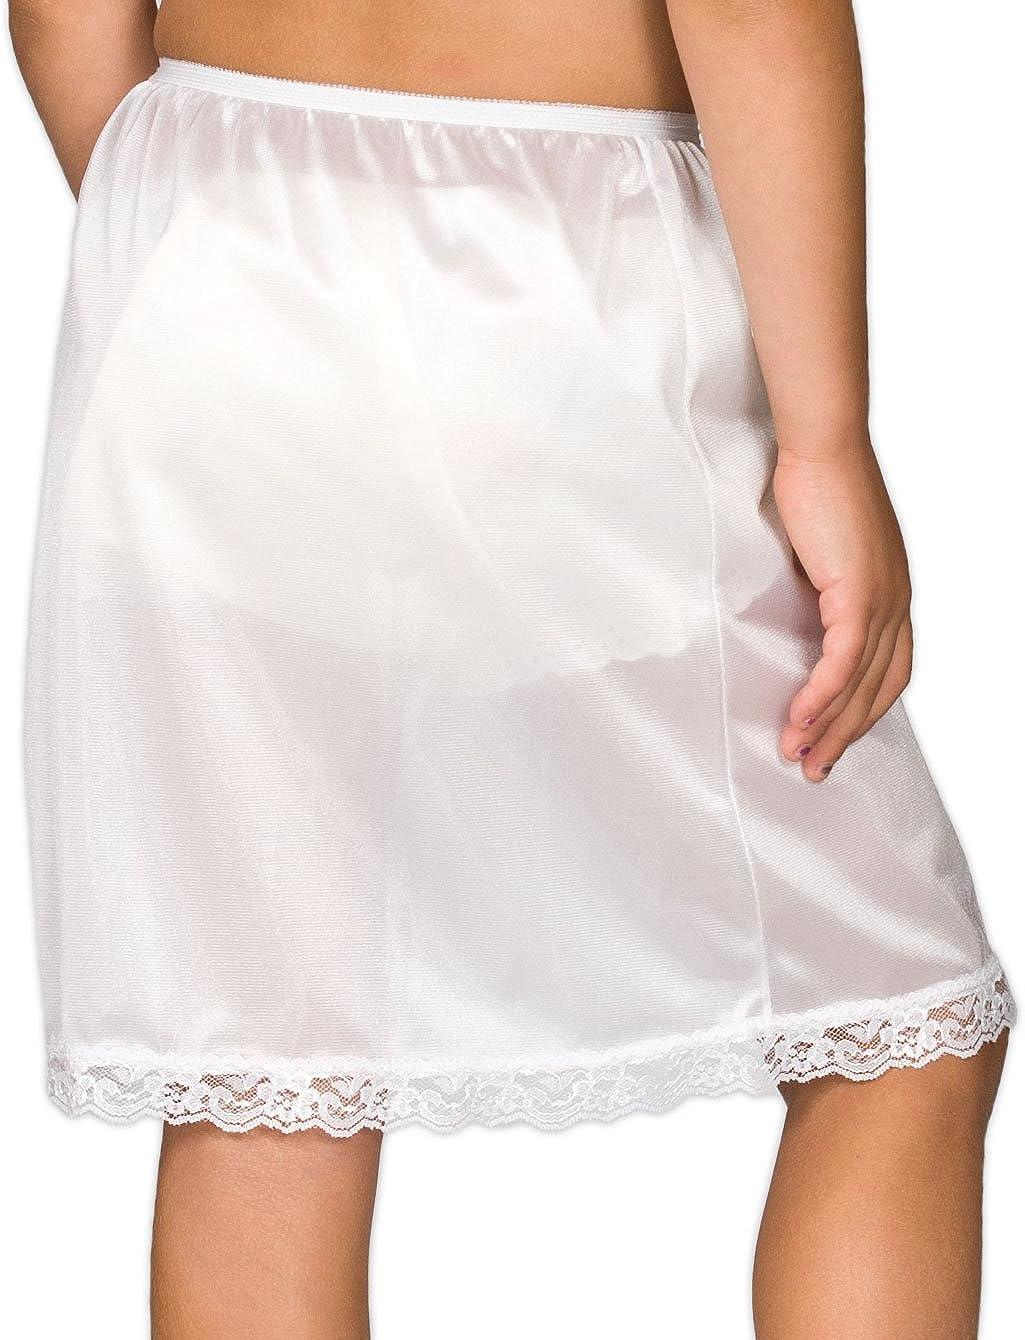 Collections Big Girls White Nylon Half Slip 8-14 I.C